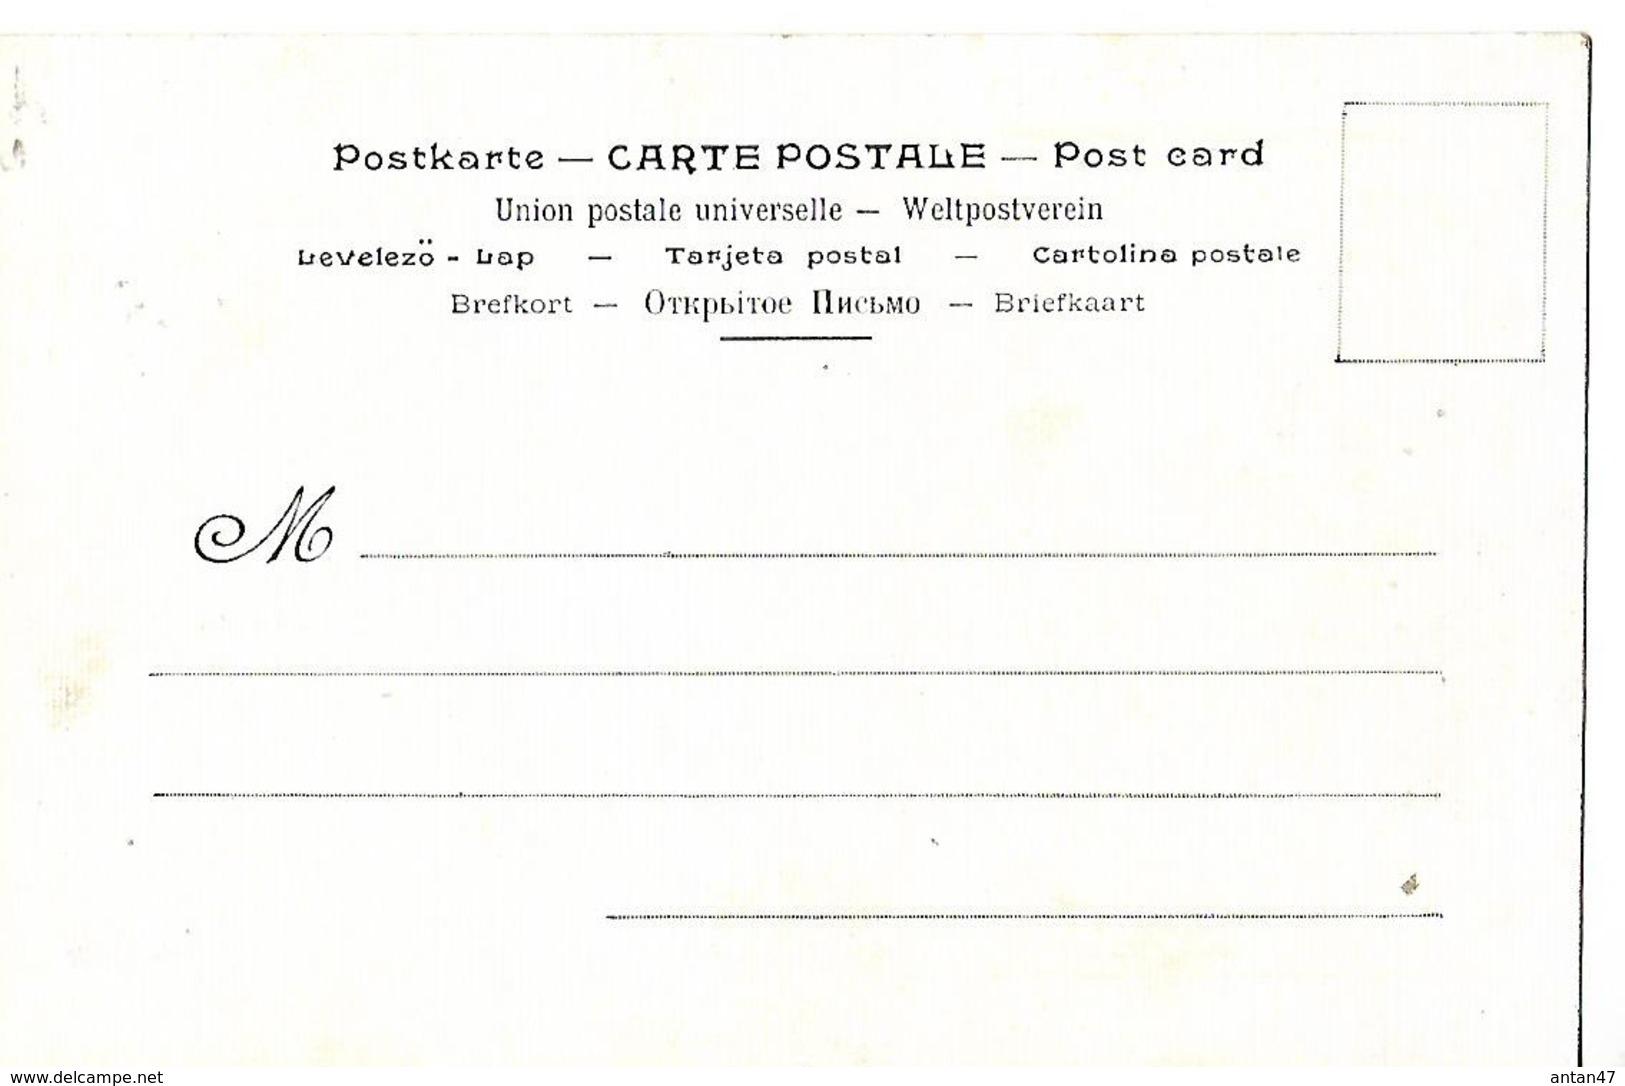 Calendrier (14 X 9 Cm) Collection JOB / 1896 / J. CHERET - Calendars